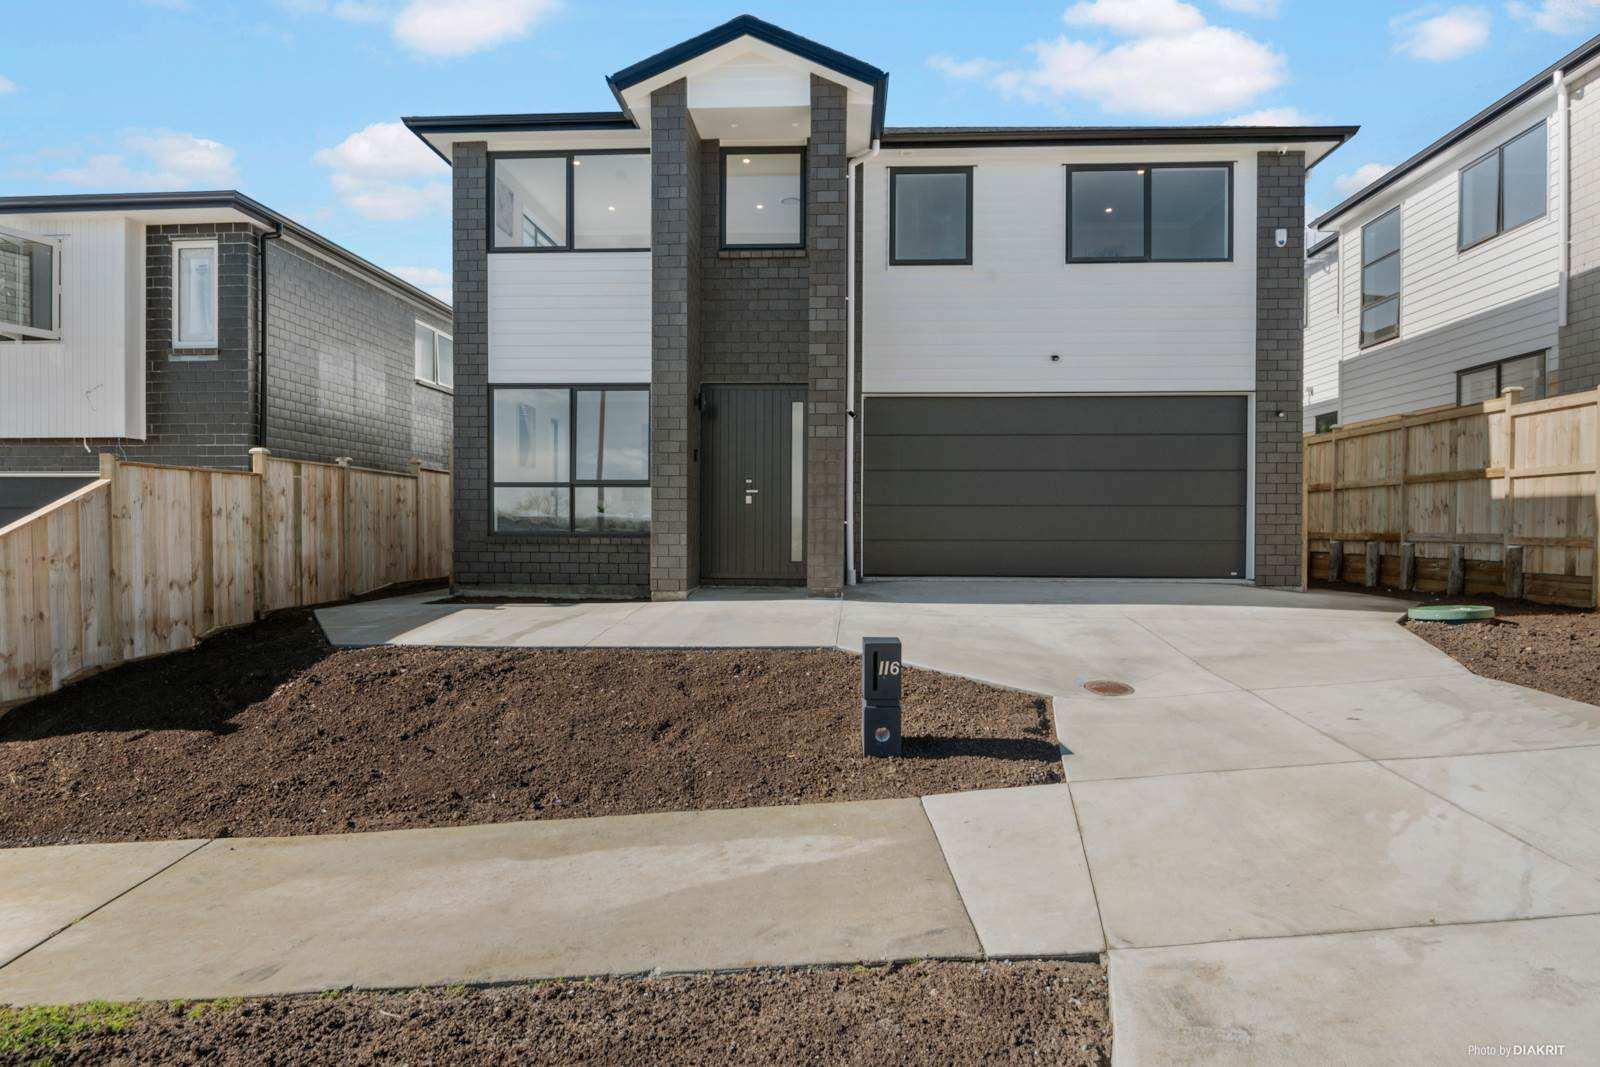 Flat Bush 7房 祖母房潜力+3个卫浴套间 10年建筑质保 品质&舒适性俱佳 地段得天独厚! Granny Potential Home with Three Ensuites